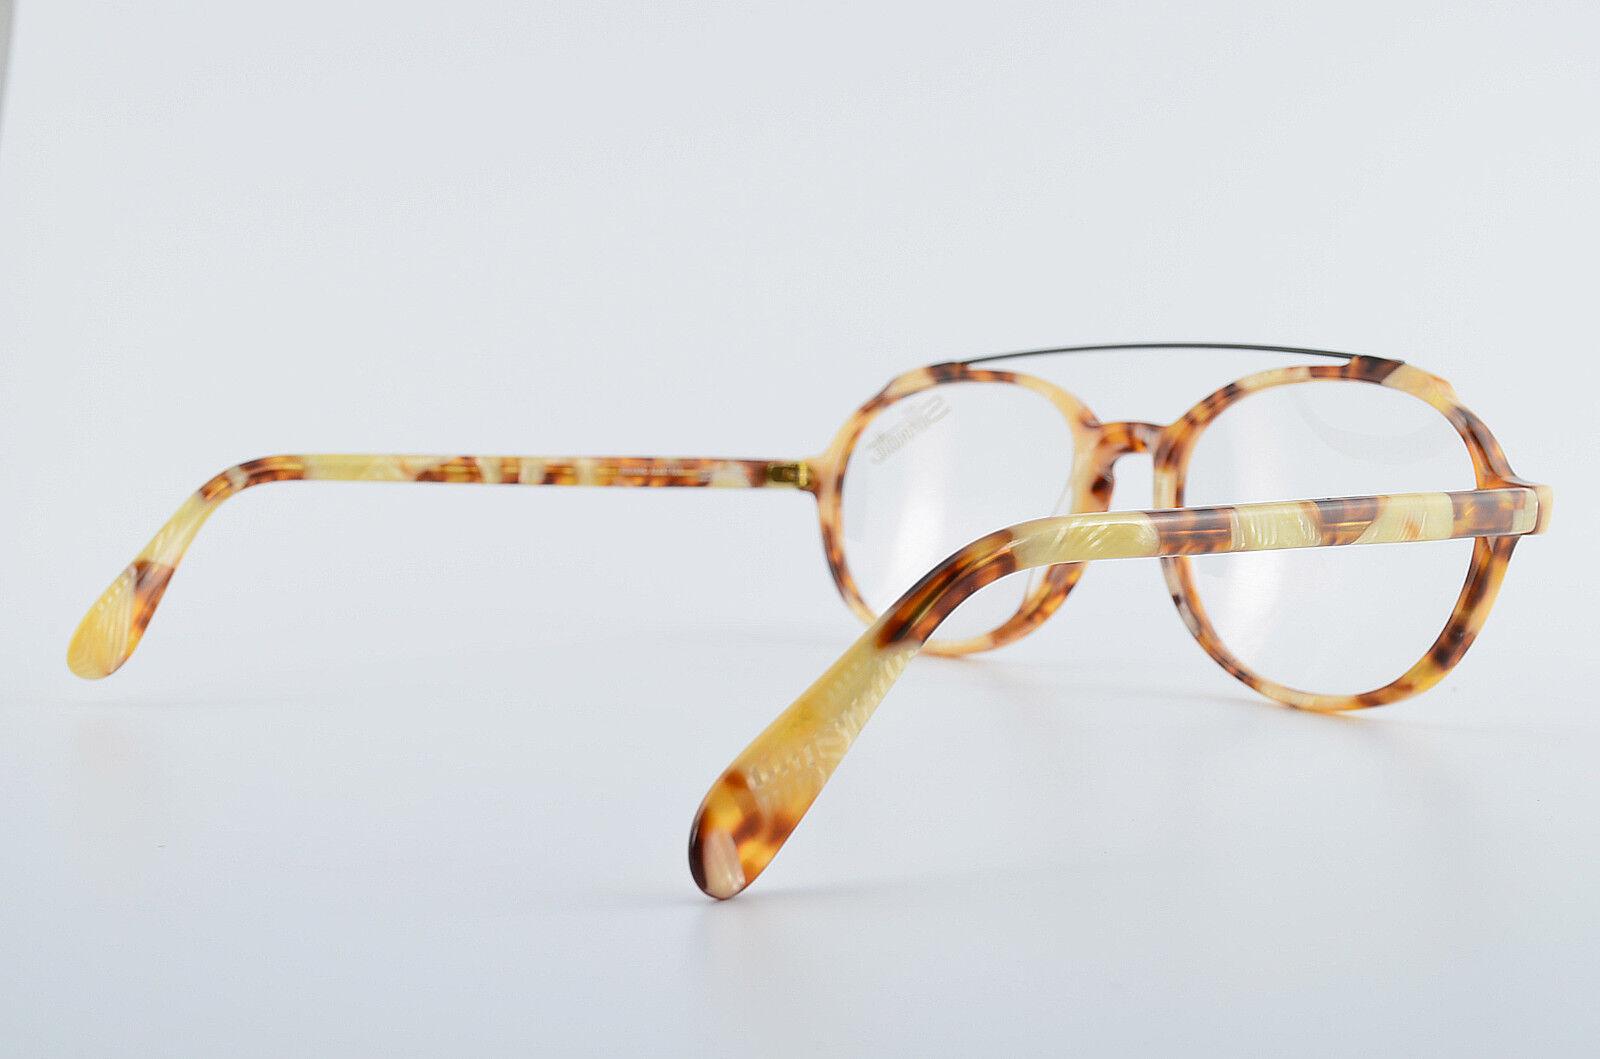 SILHOUETTE Brille Brille Brille 1304 40-2314 Eye Frame Vintage Classic 90s Style Double Bridge | Qualität Produkt  | Der neueste Stil  | Online Outlet Shop  | Good Design  6f5dcf